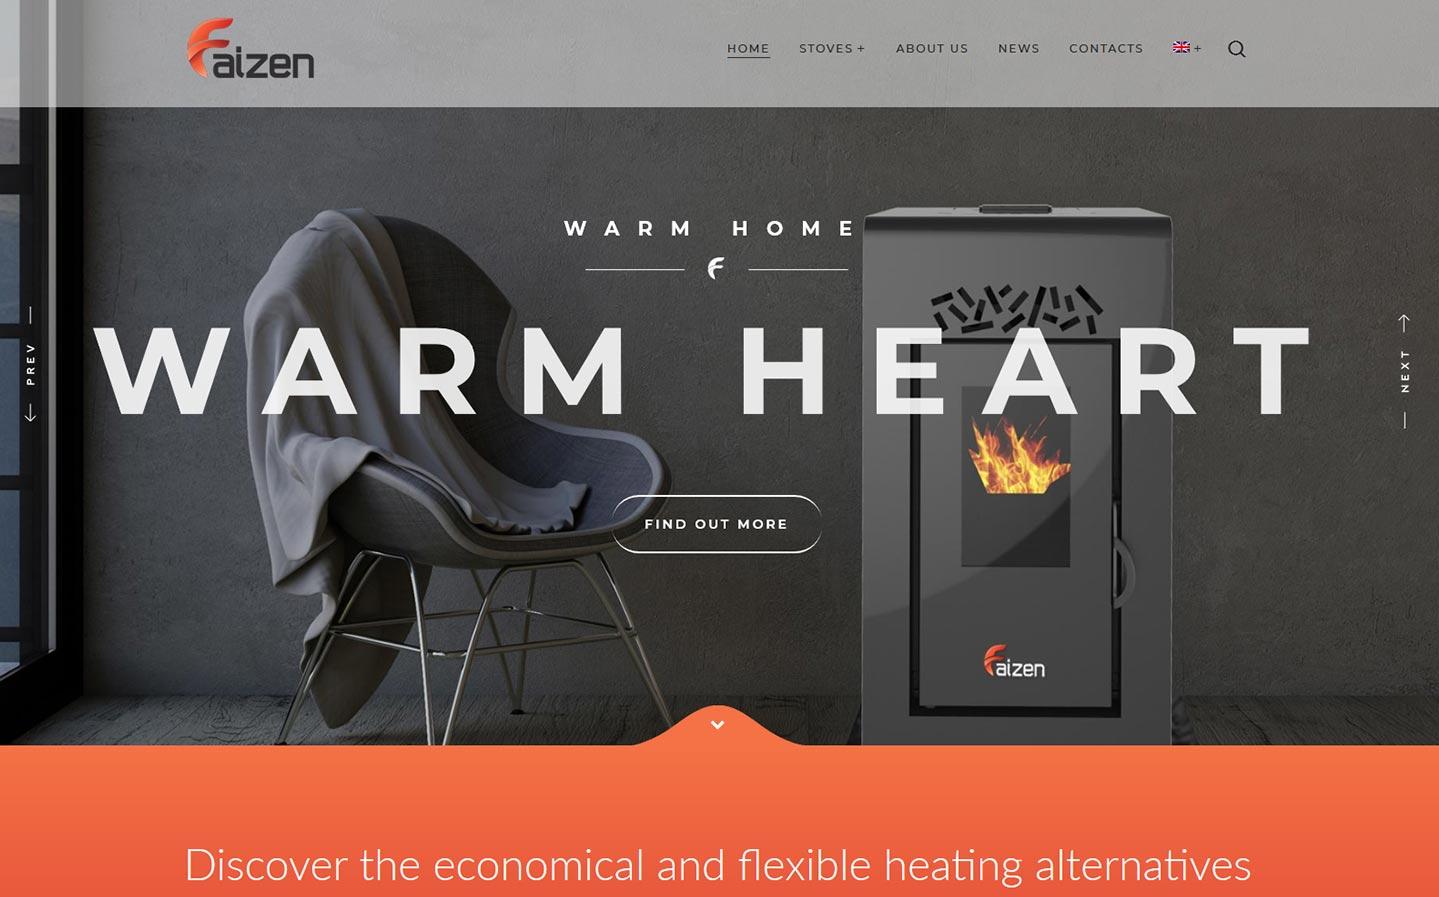 rade-koncar-tep-faizen-pelet-stoves-web-mockup.jpg